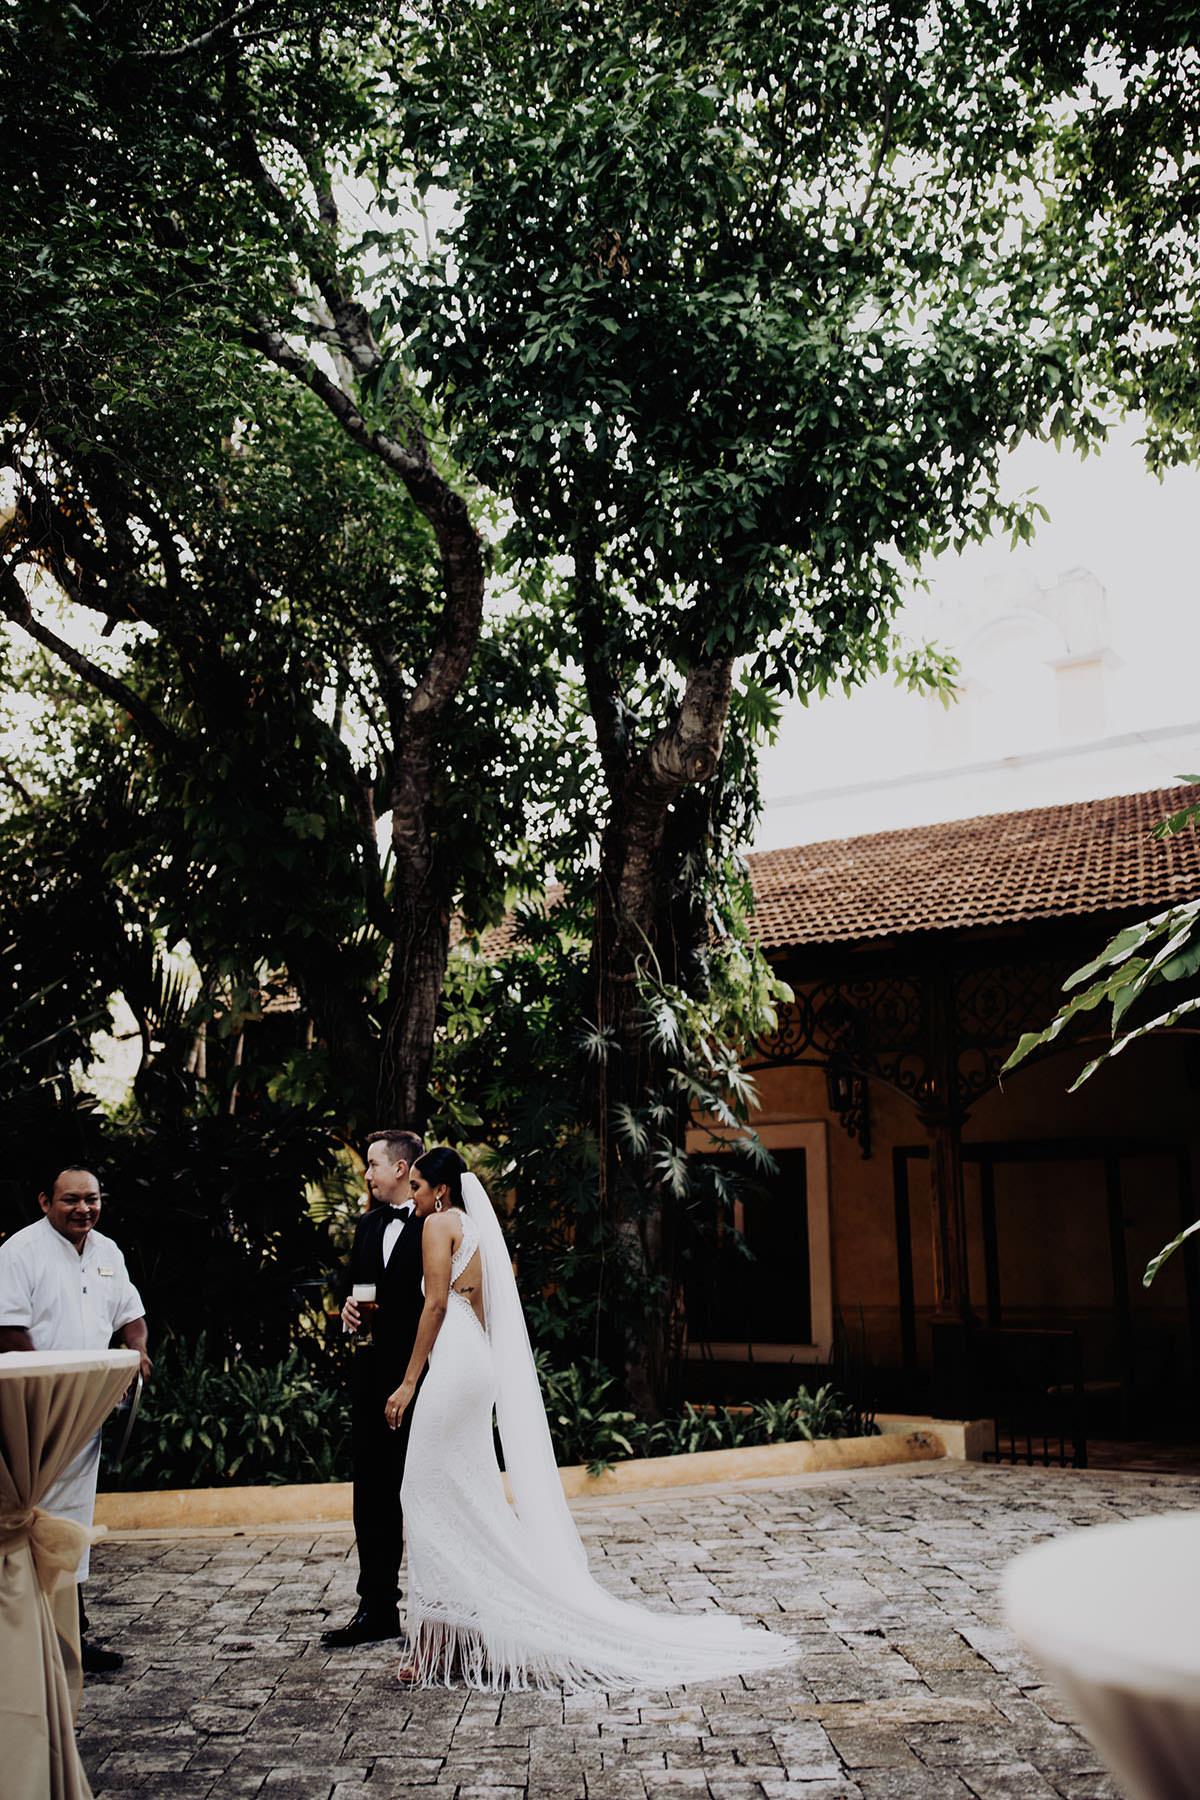 merida-mexico-wedding-destination-wedding-photographer-139.jpg